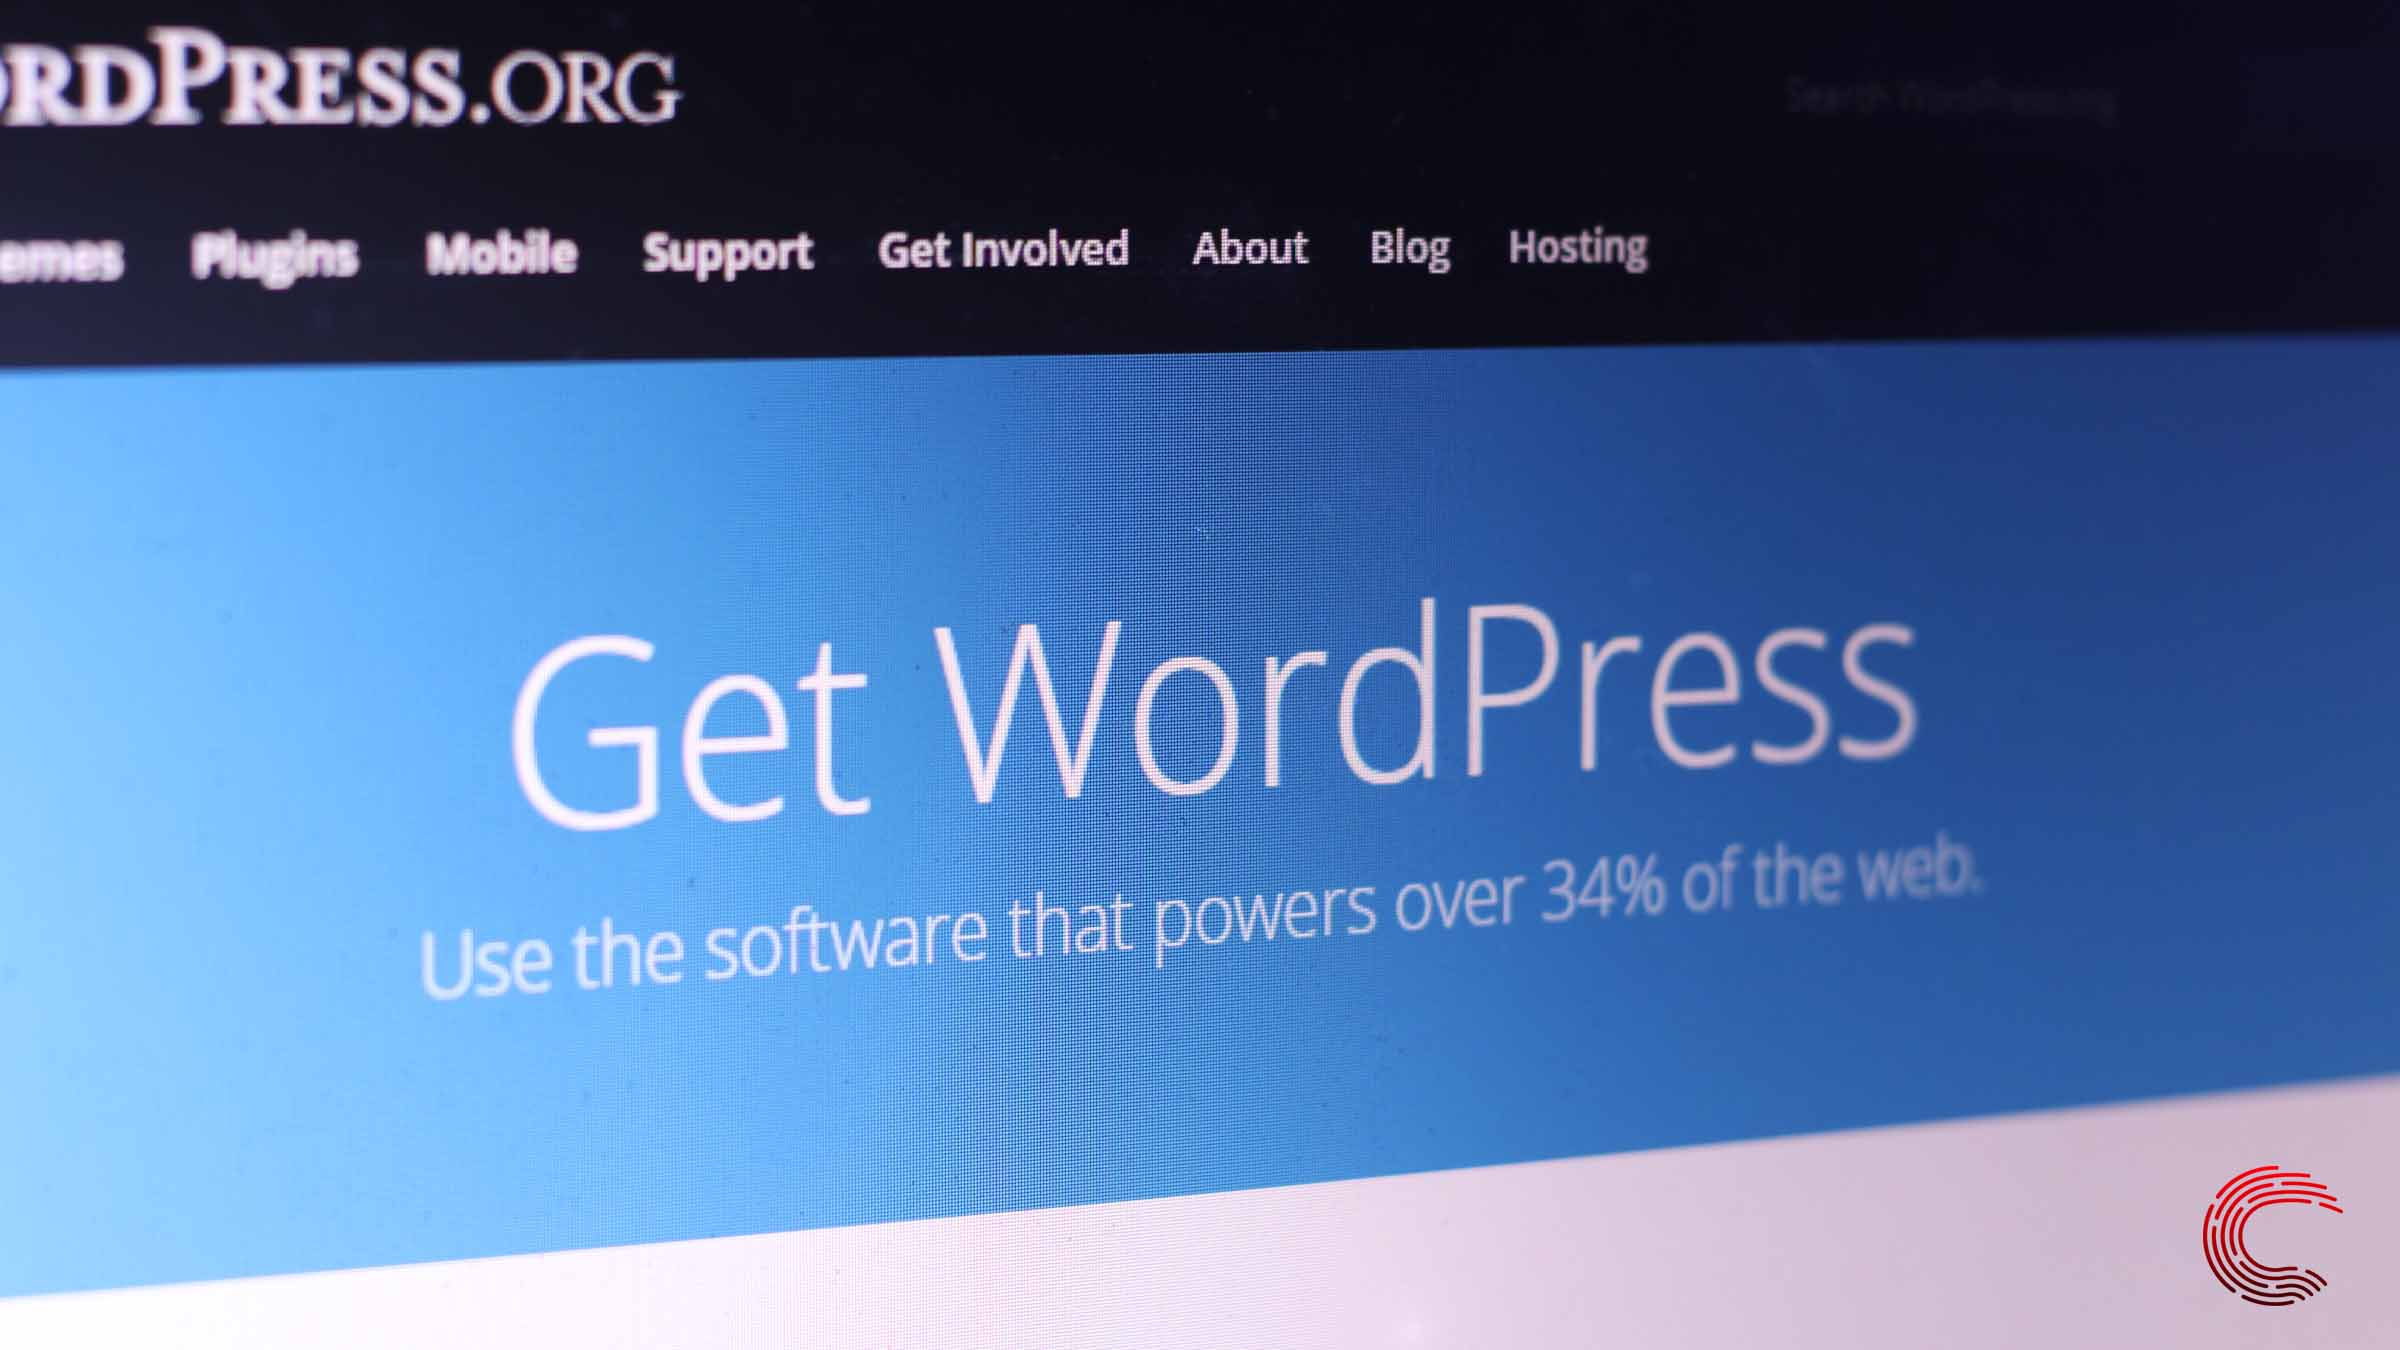 How to install WordPress on XAMPP? 7 easy steps to do so